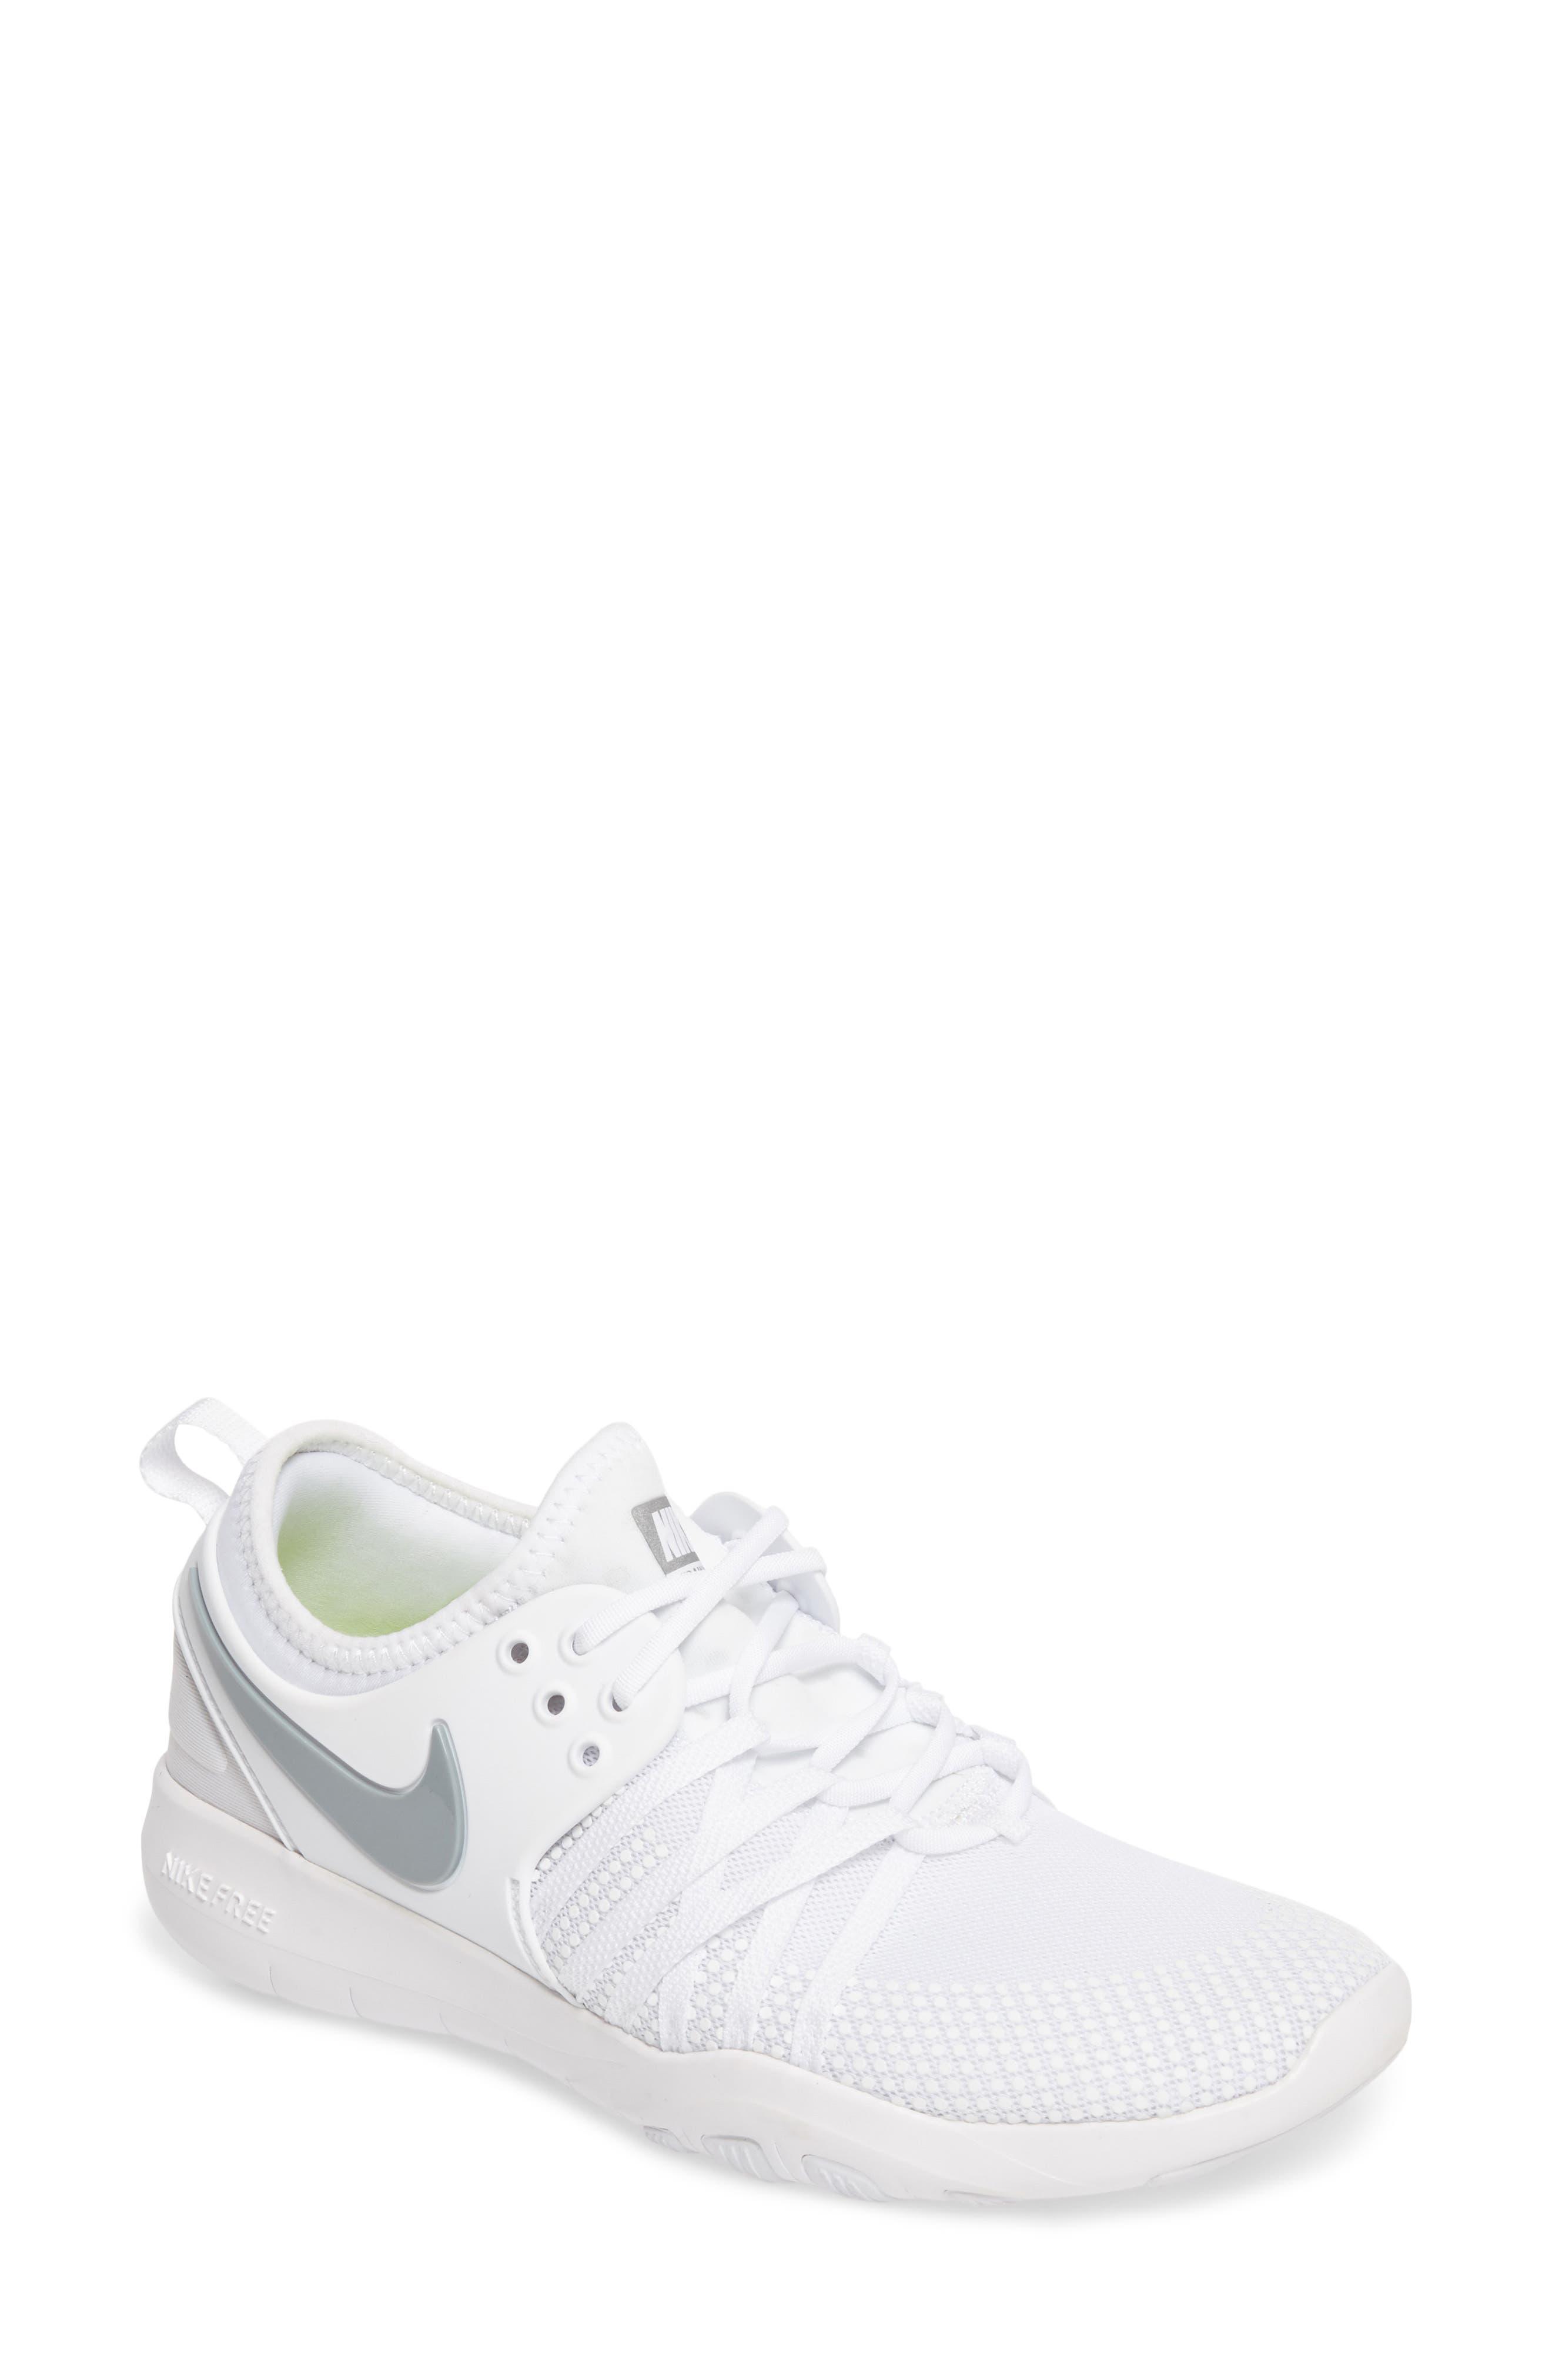 Free TR 7 Training Shoe,                             Main thumbnail 1, color,                             White/ Metallic Silver